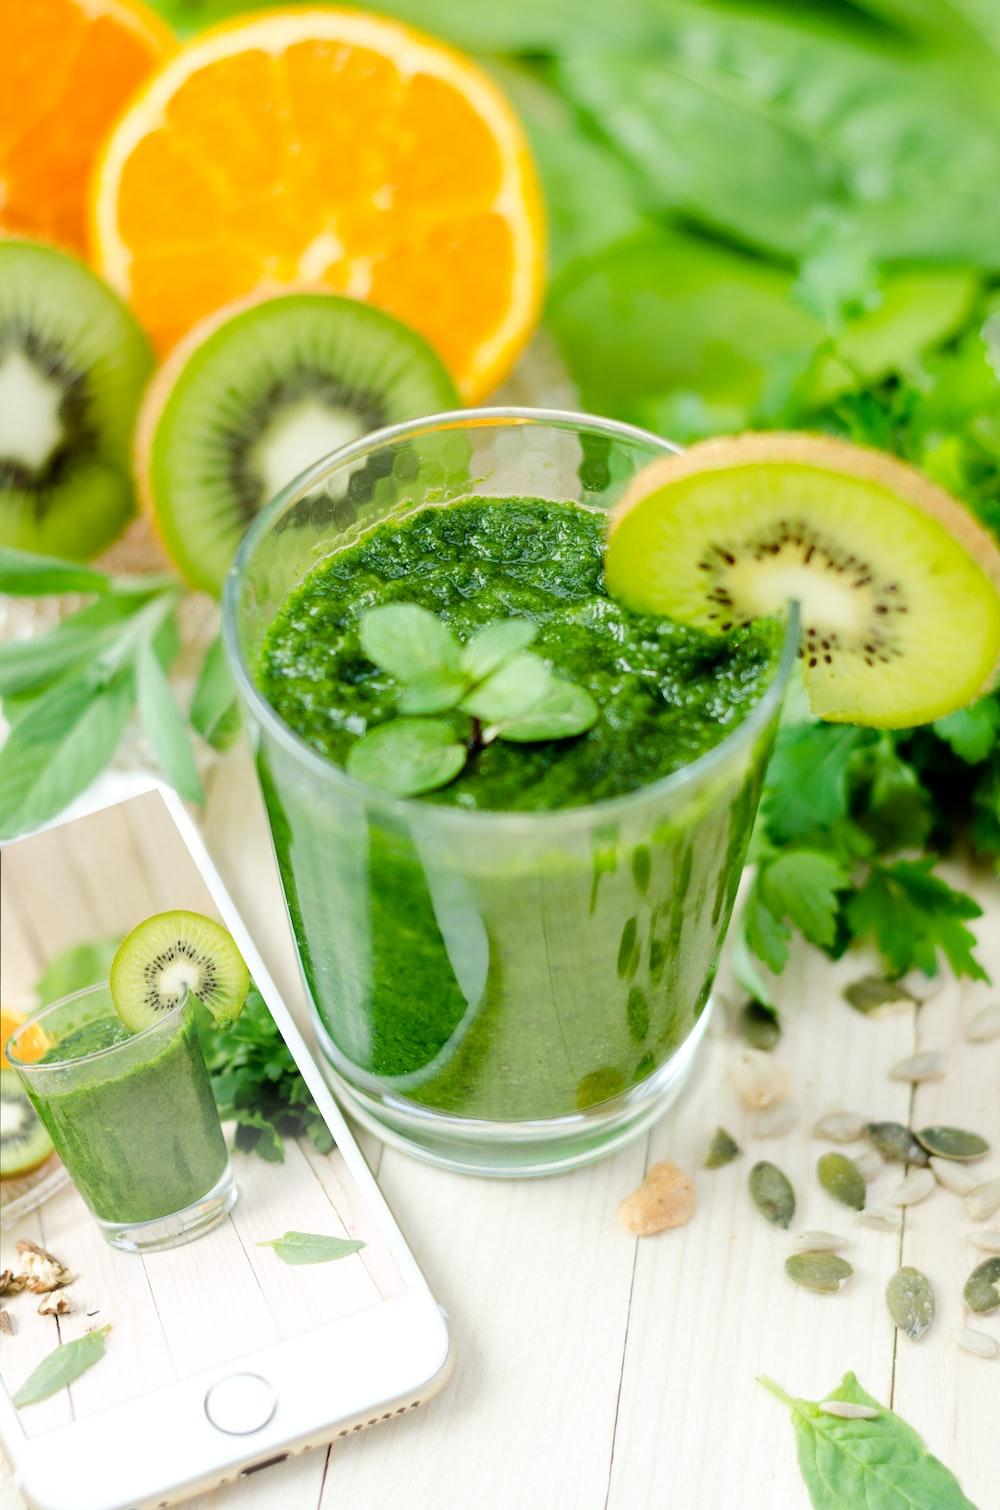 green shake fruits with kiwi